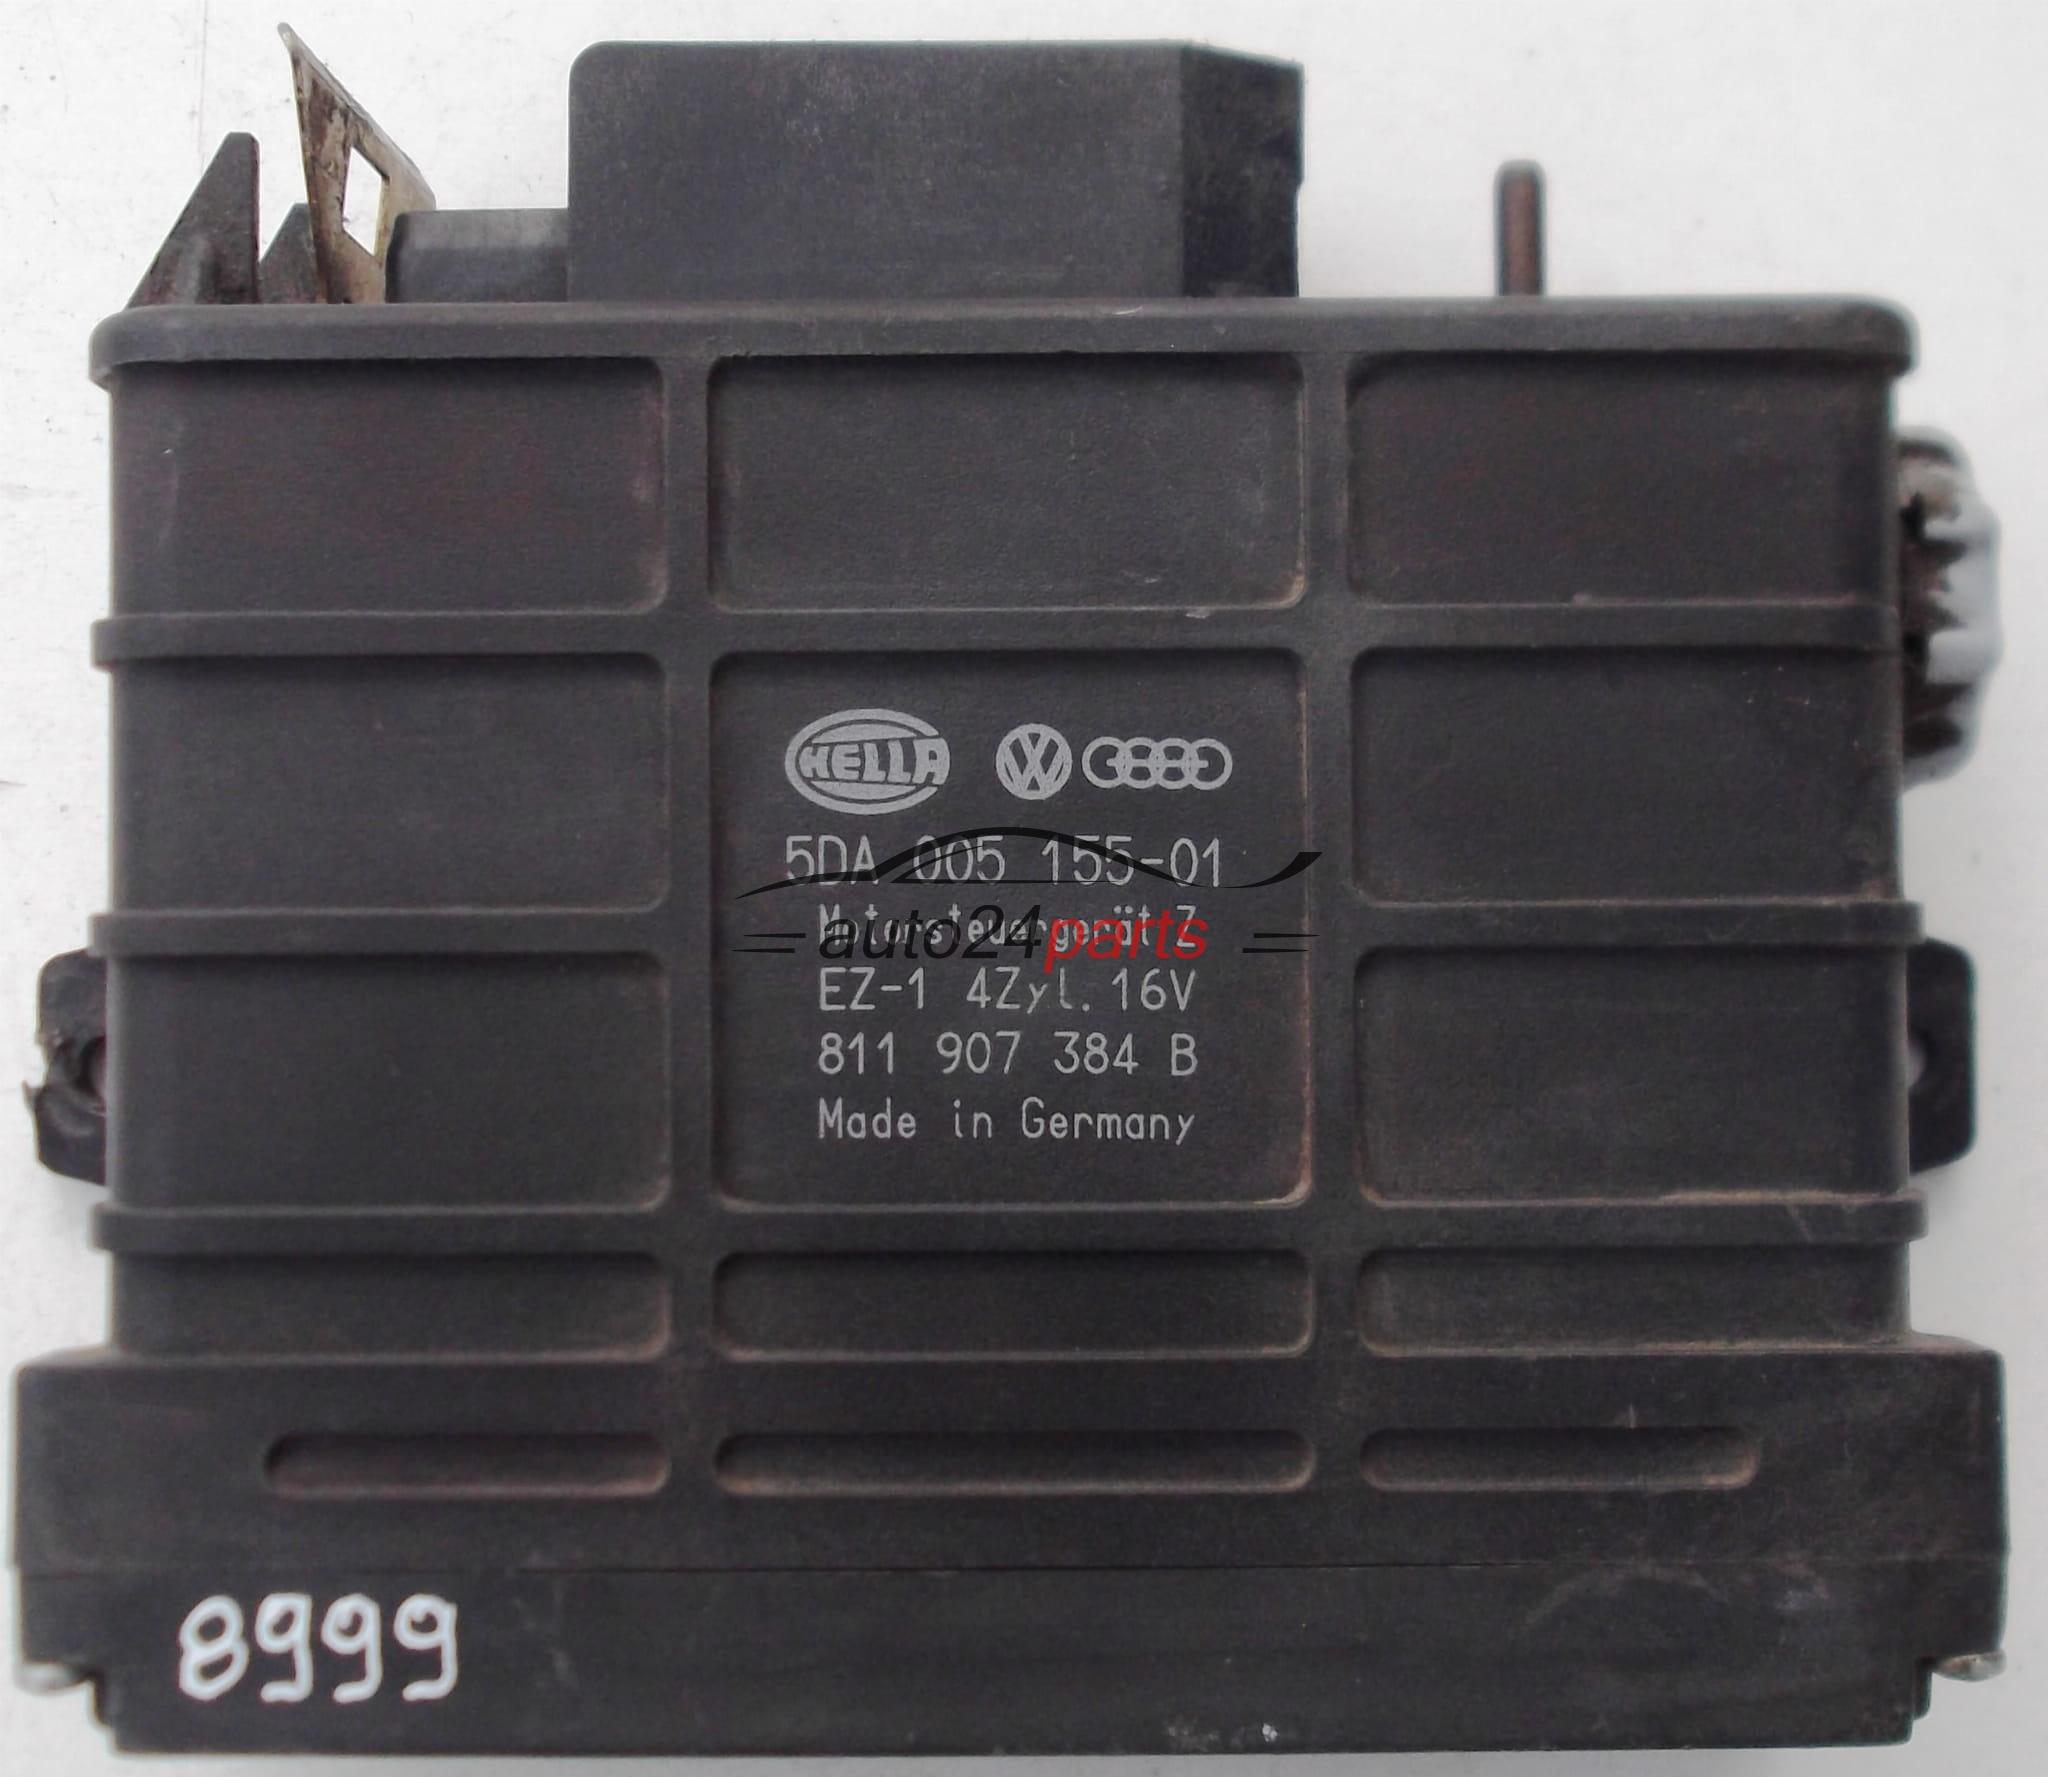 Ignition control module VOLKSWAGEN AUDI HELLA 5DA 005 155-01, 5DA00515501,  811 907 384 B, 811907384B